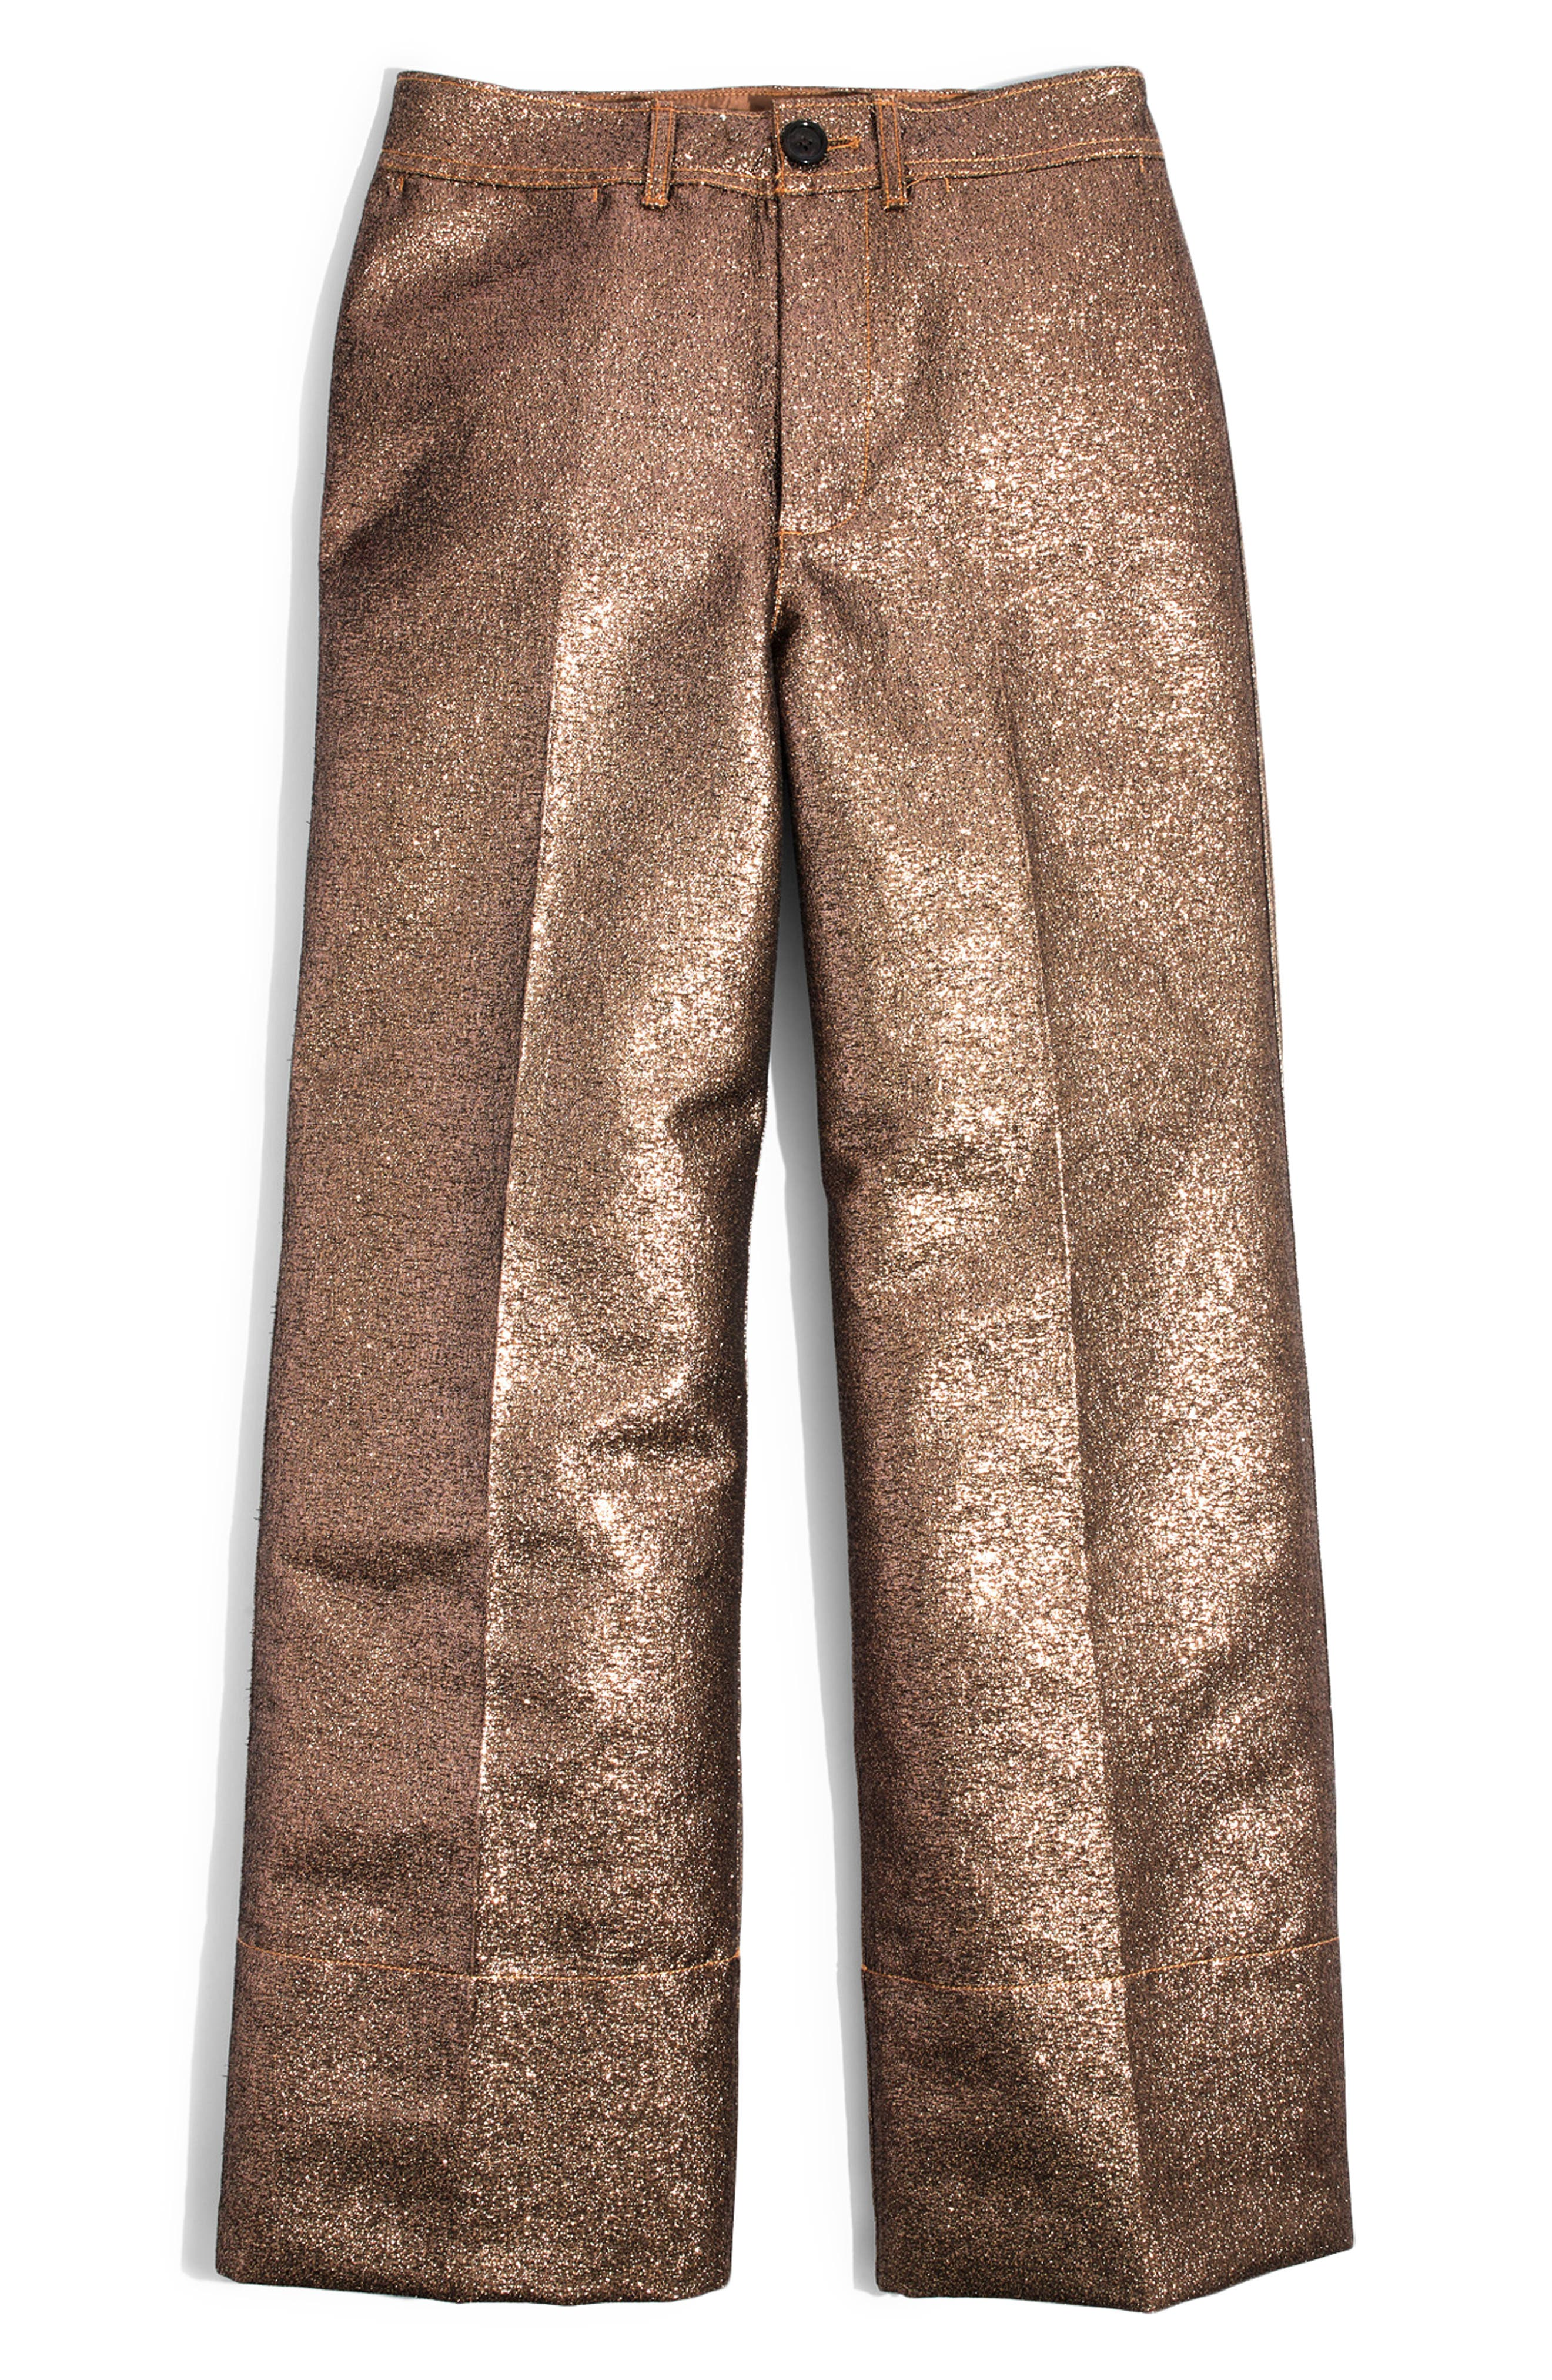 Langford Metallic Crop Wide Leg Pants,                             Alternate thumbnail 5, color,                             METALLIC SAND